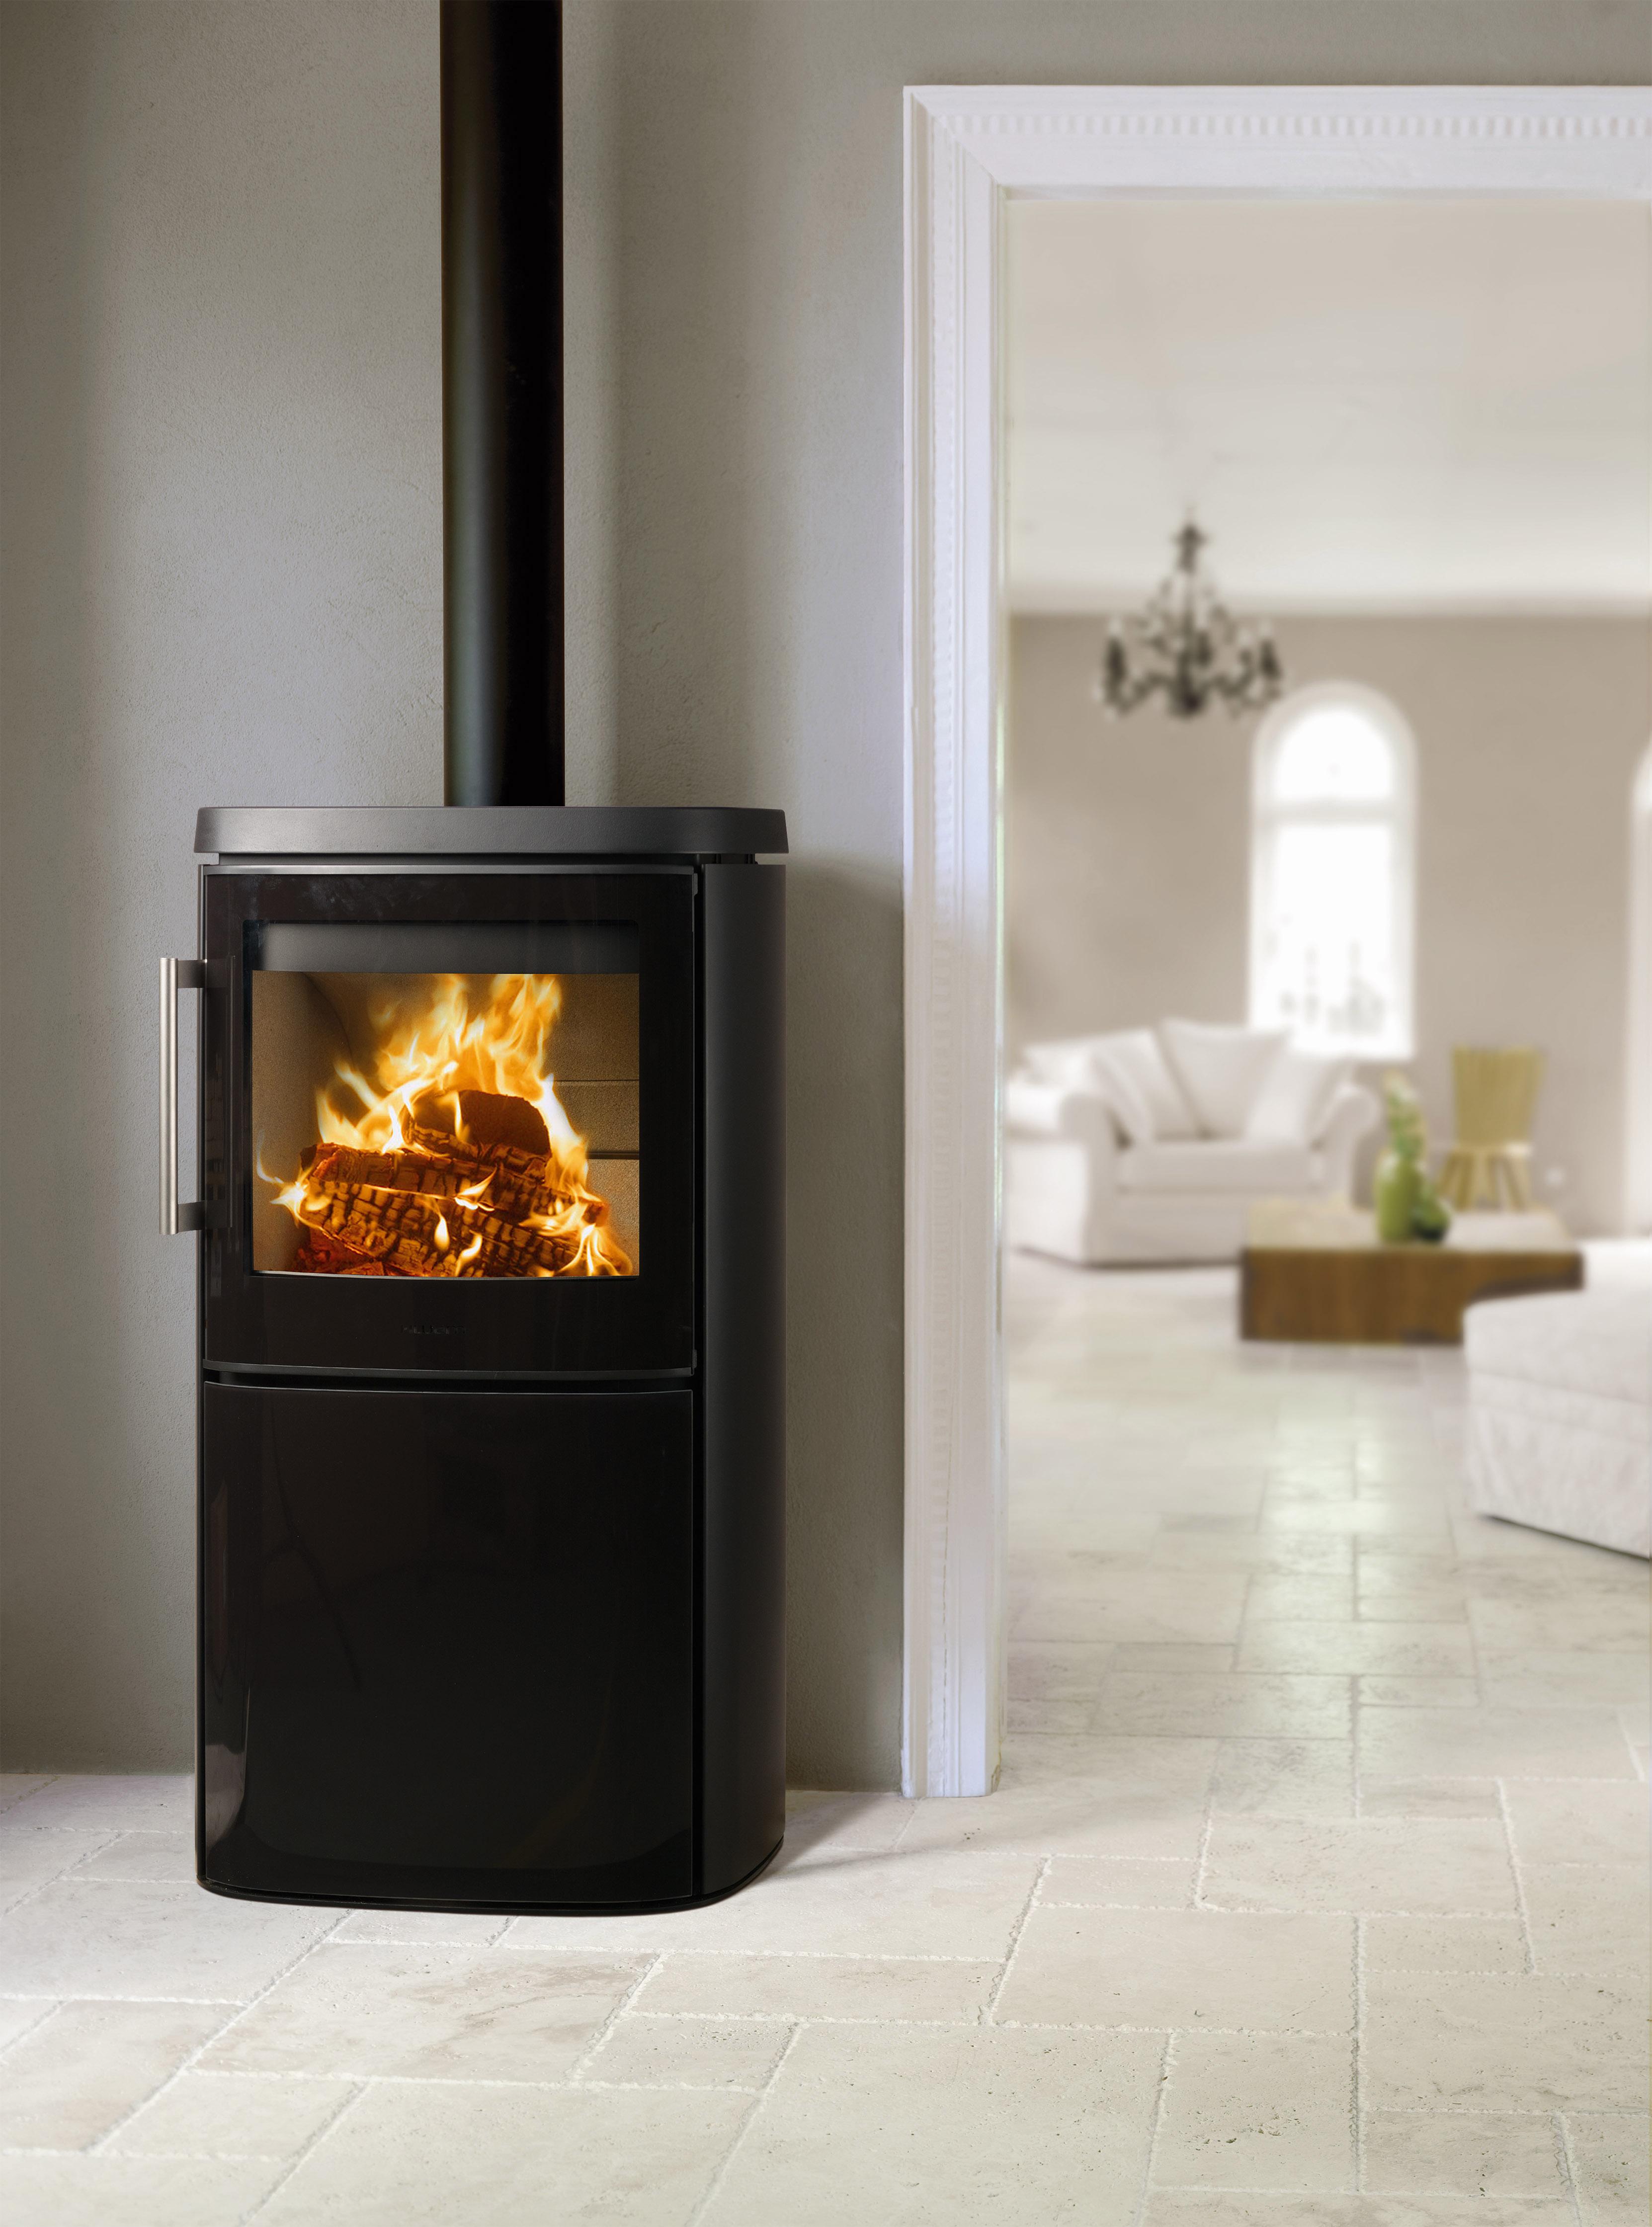 hwam kaminofen 4640 c mc m. Black Bedroom Furniture Sets. Home Design Ideas